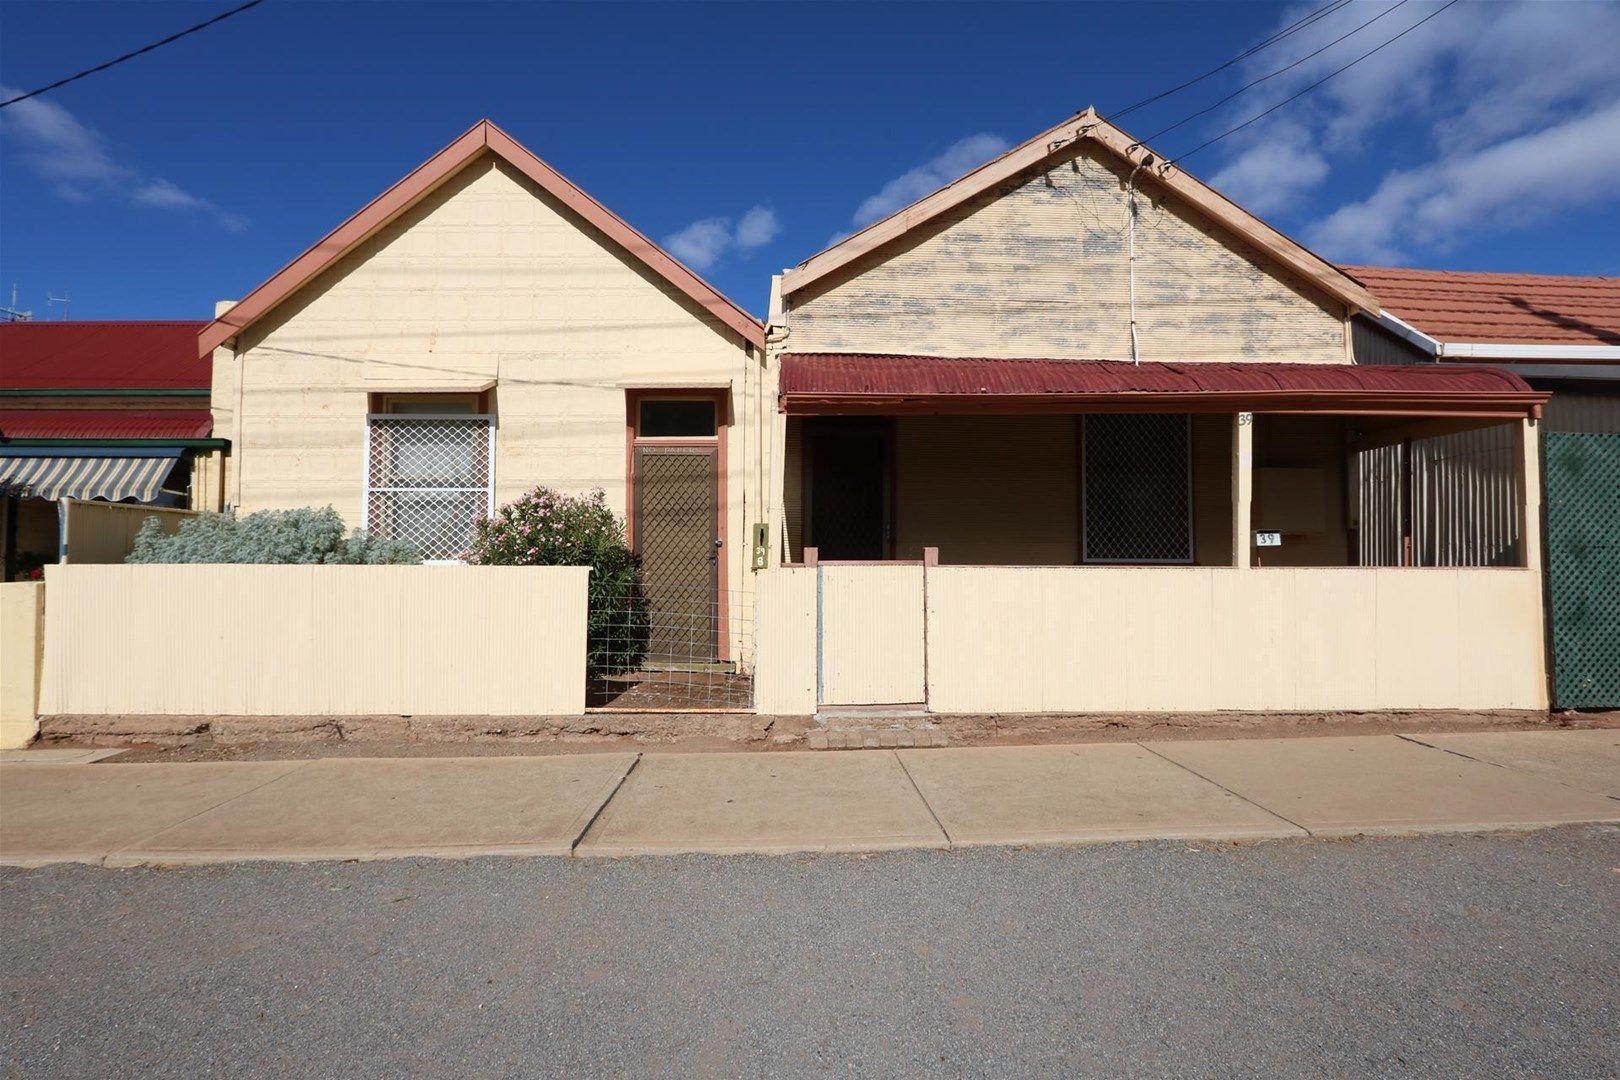 39-41 Blende Street, Broken Hill NSW 2880, Image 0